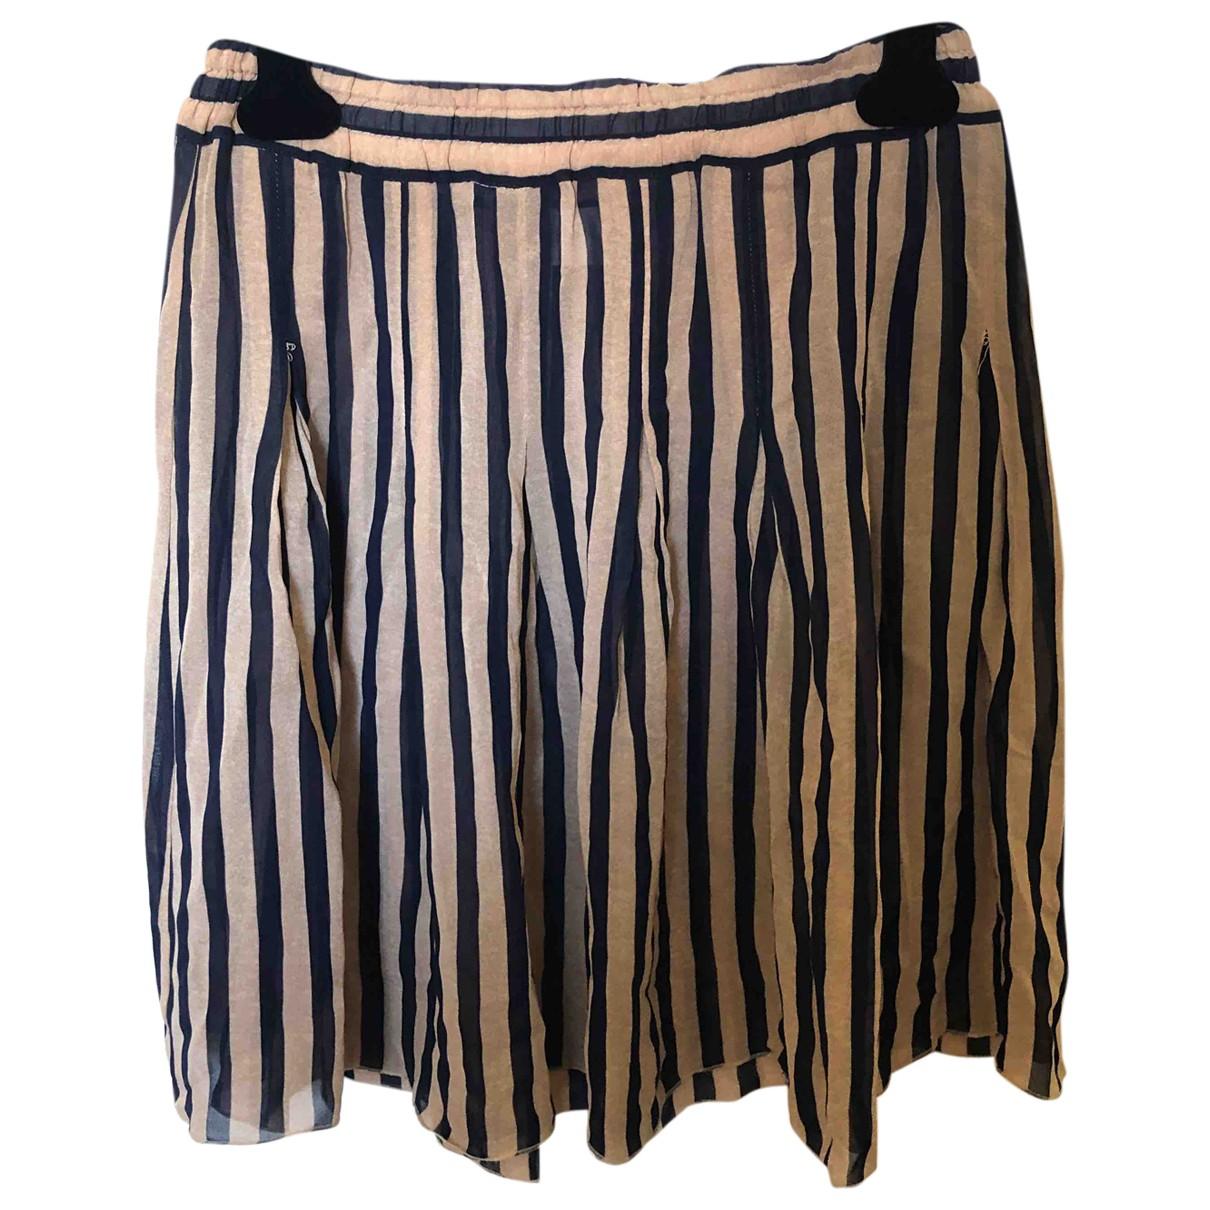 Forte_forte \N Beige skirt for Women One Size IT